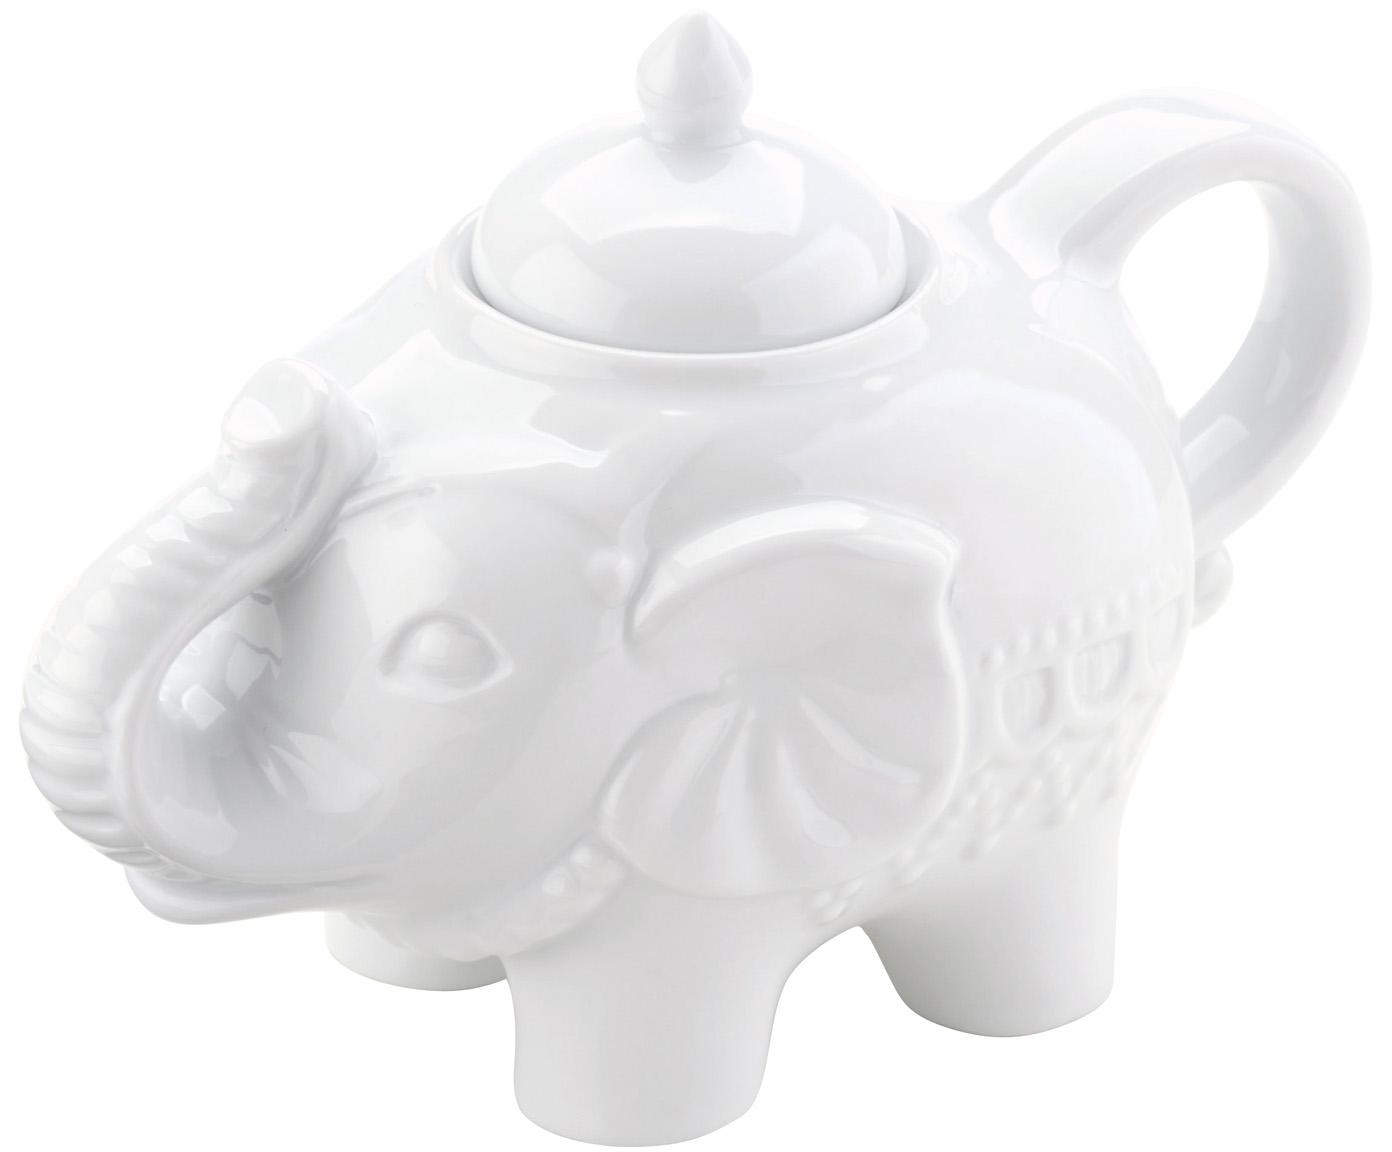 Zuckerdose Elephant, Porzellan, Weiss, 15 x 12 cm